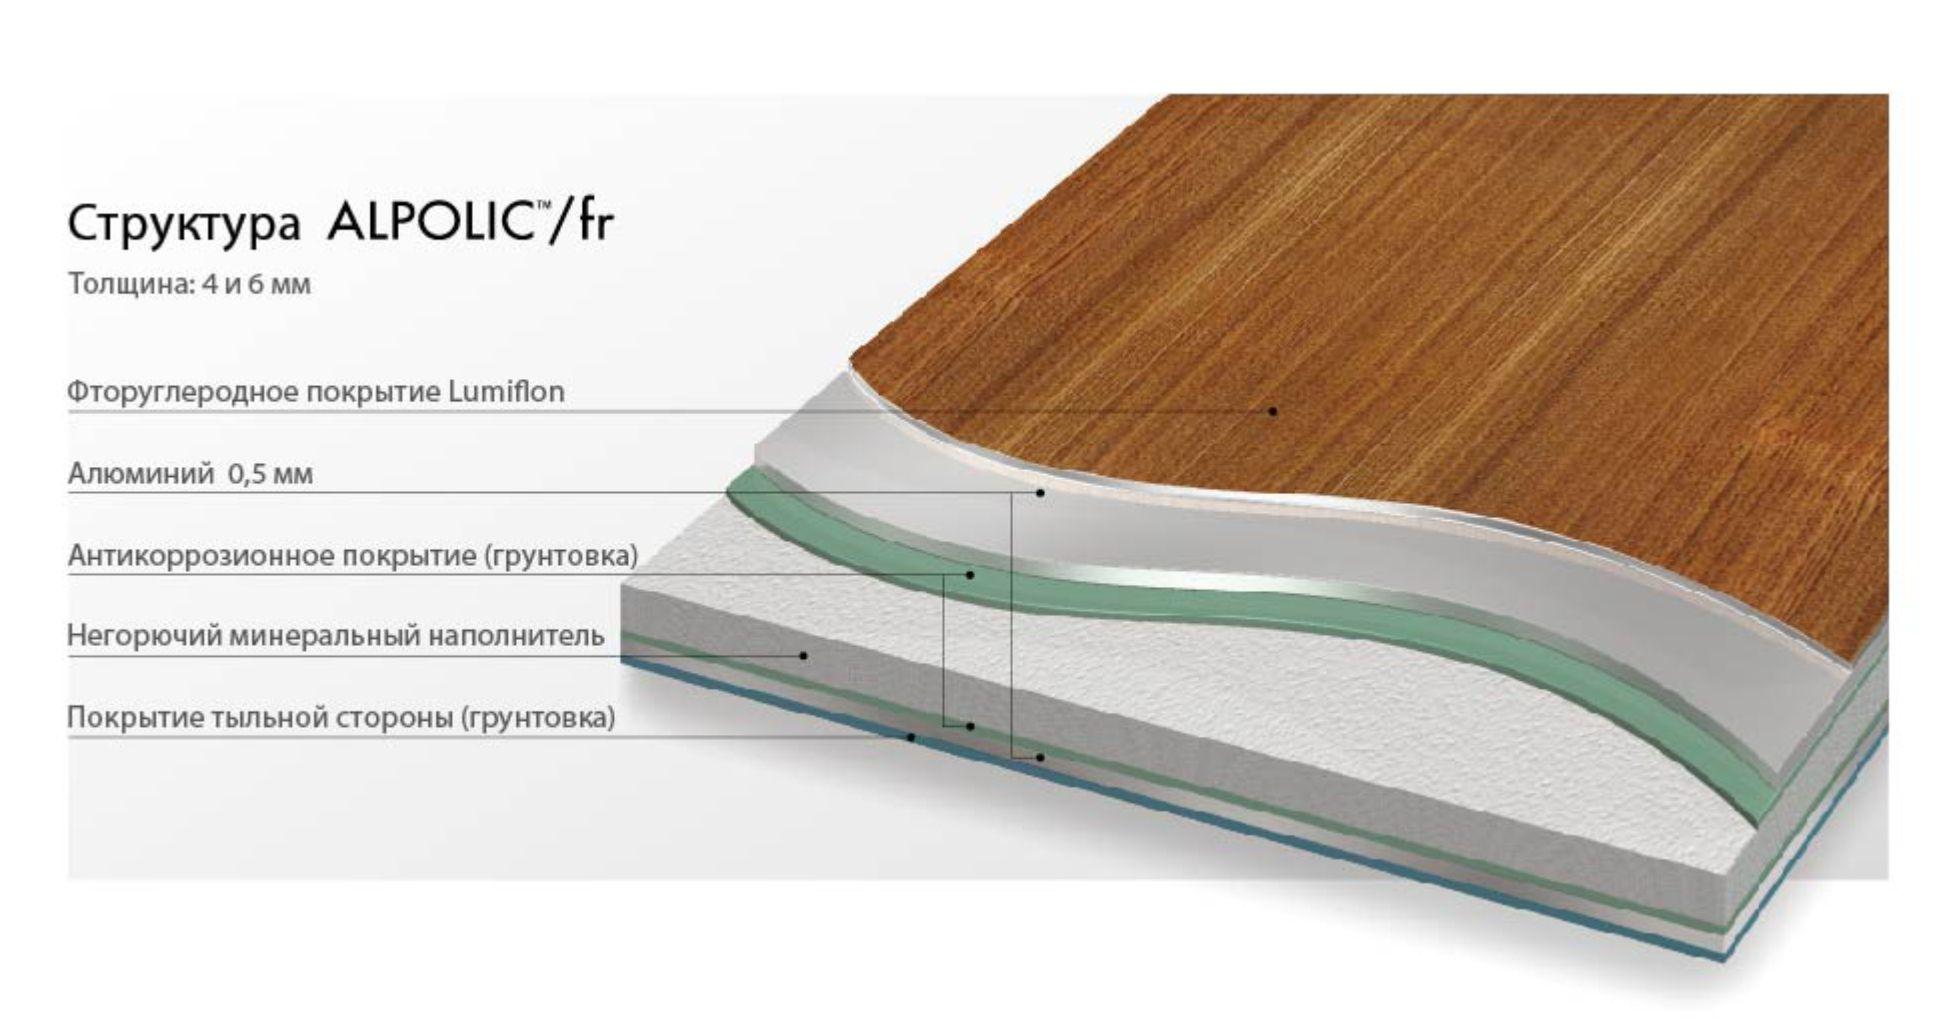 Структура ALPOLIC/fr ACM